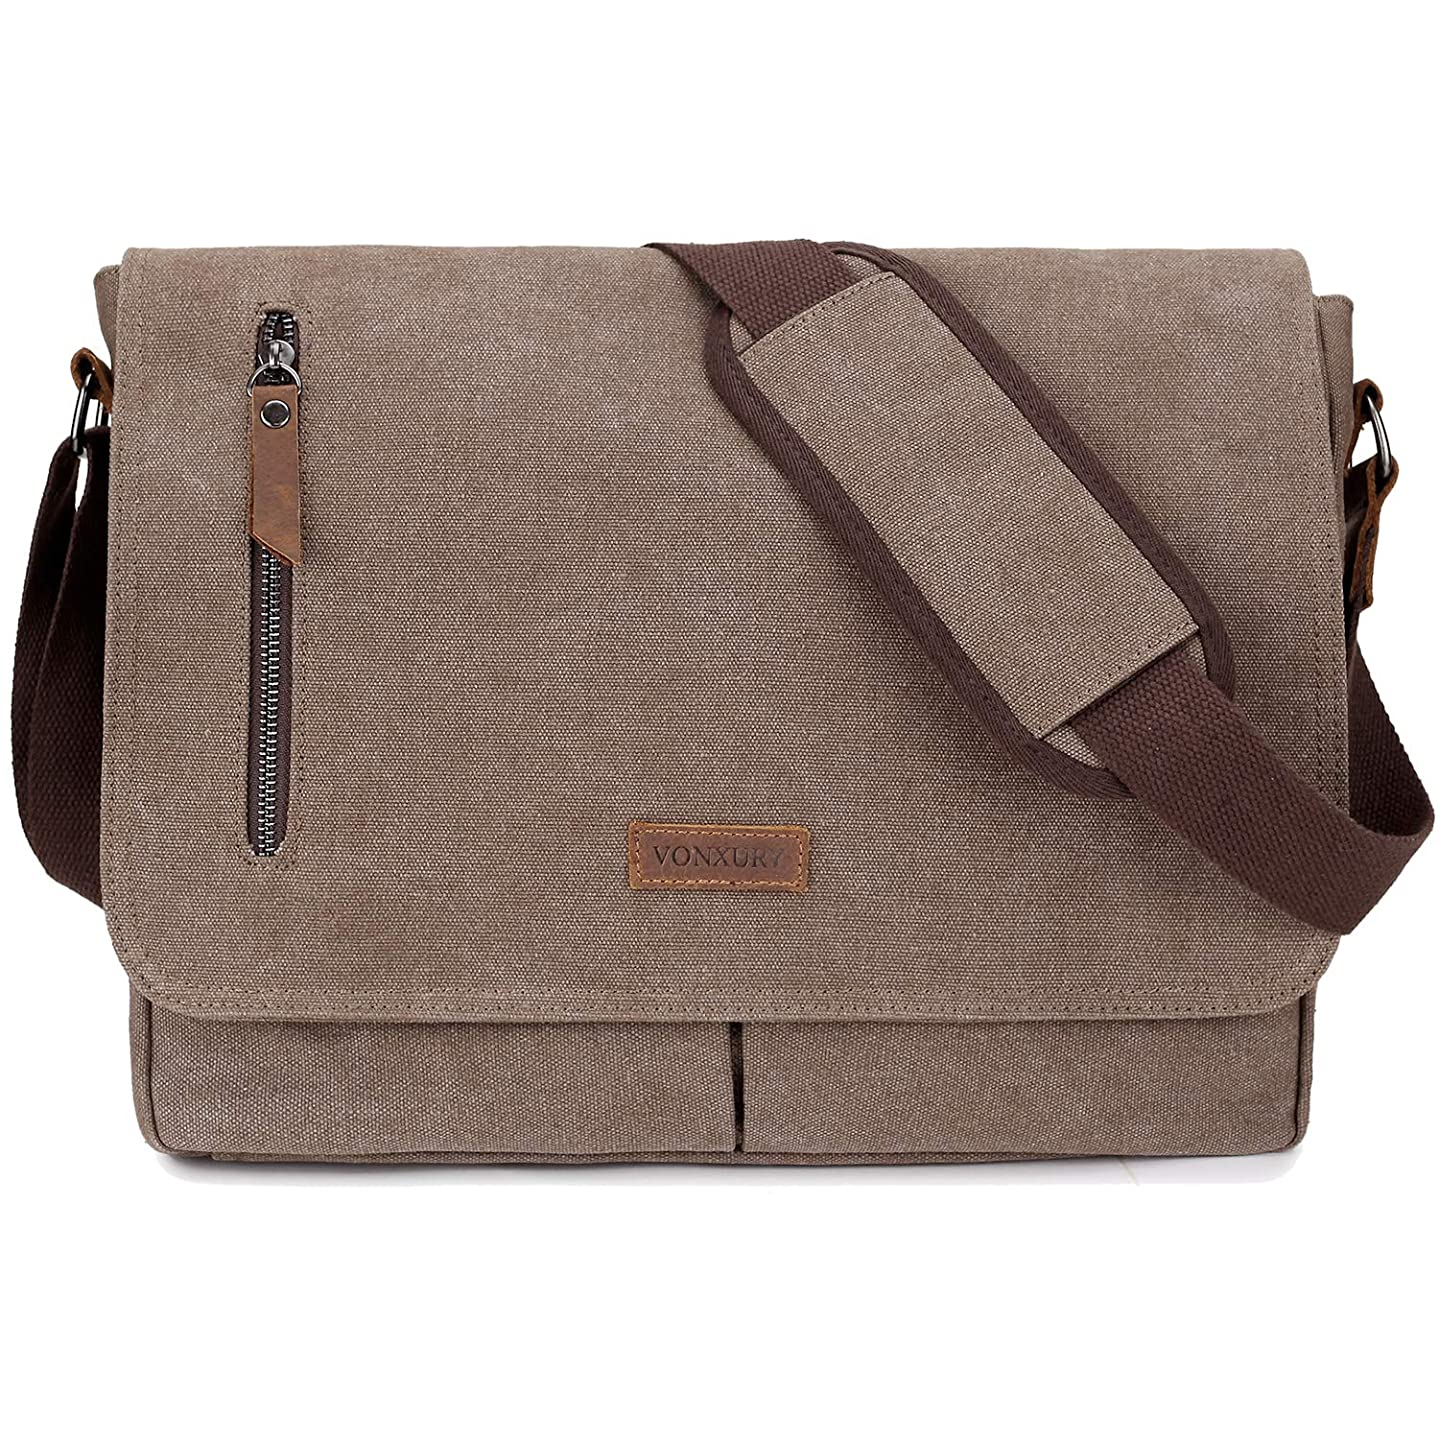 14 Inch Laptop Messenger Bag For Men And Women,Canvas Satchel Leather Shoulder Bag For Work School VONXURY